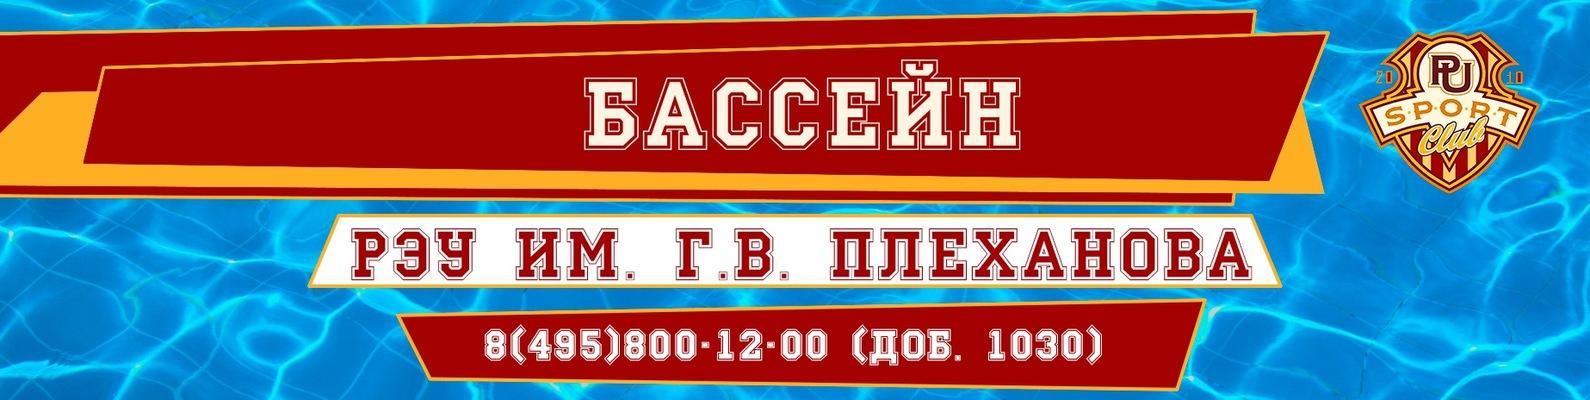 Справки в бассейн отмена Москва Кузьминки